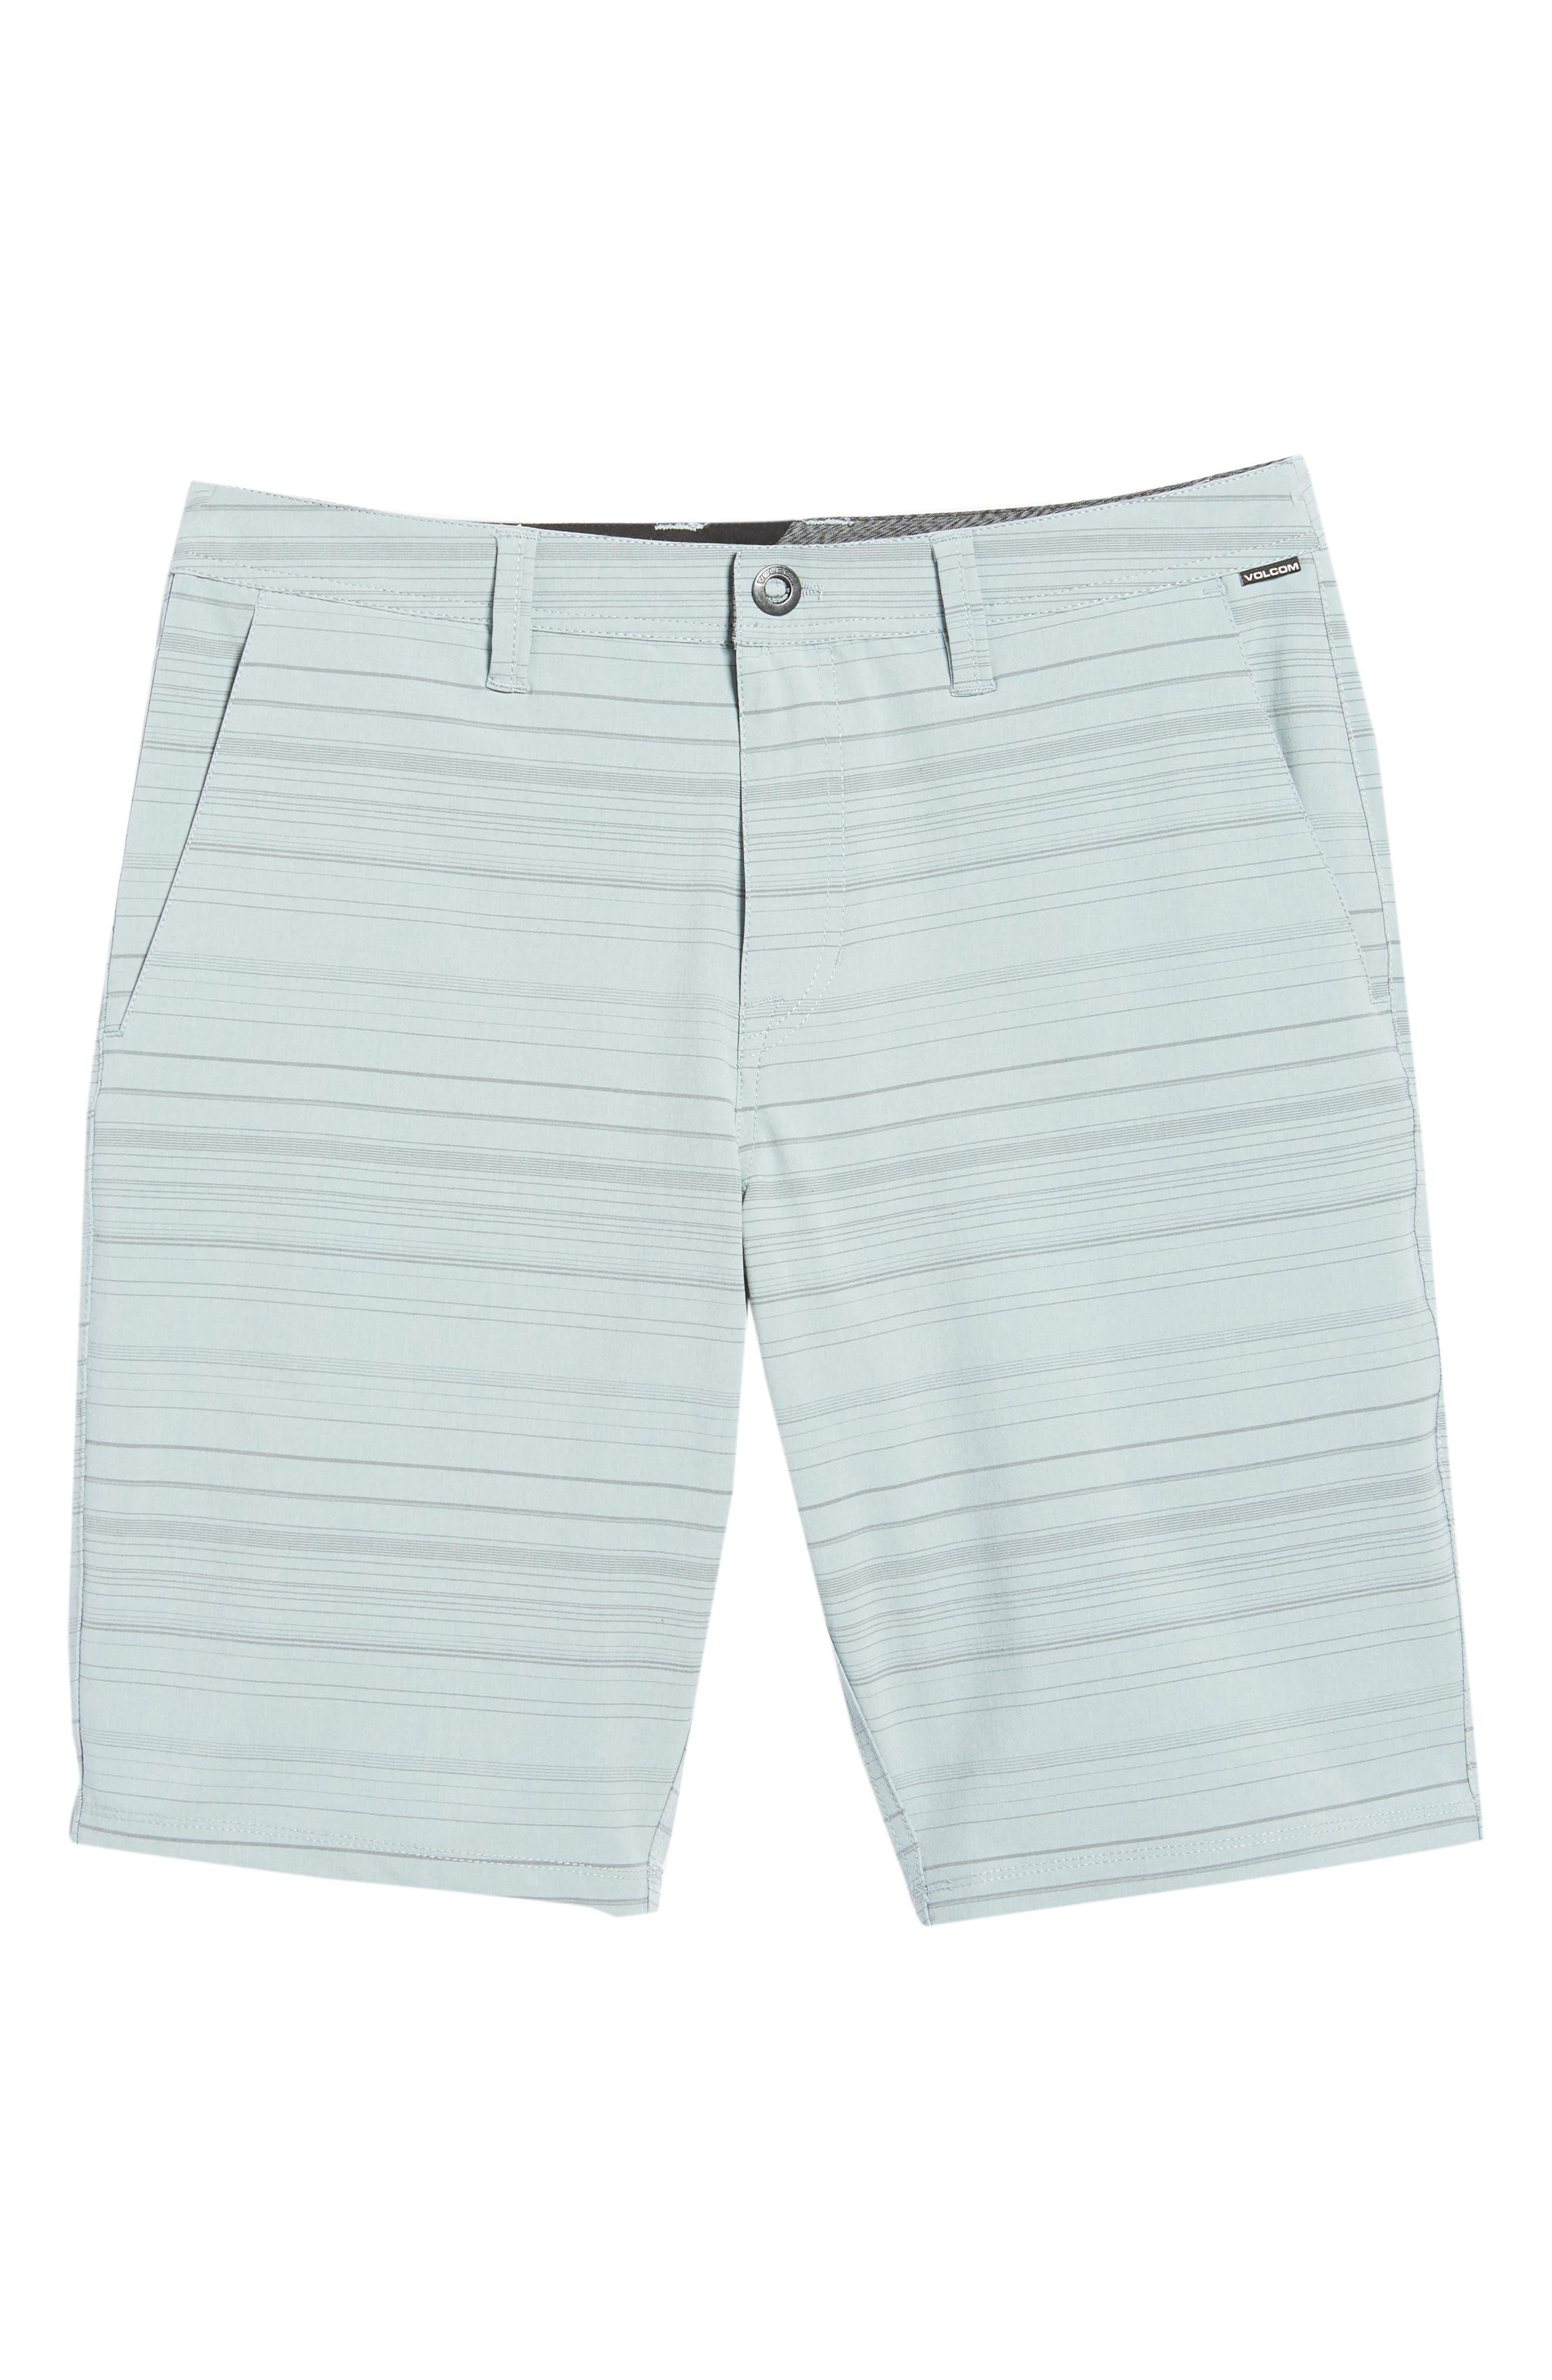 Surf N' Turf Mix Hybrid Shorts,                             Alternate thumbnail 6, color,                             Lead